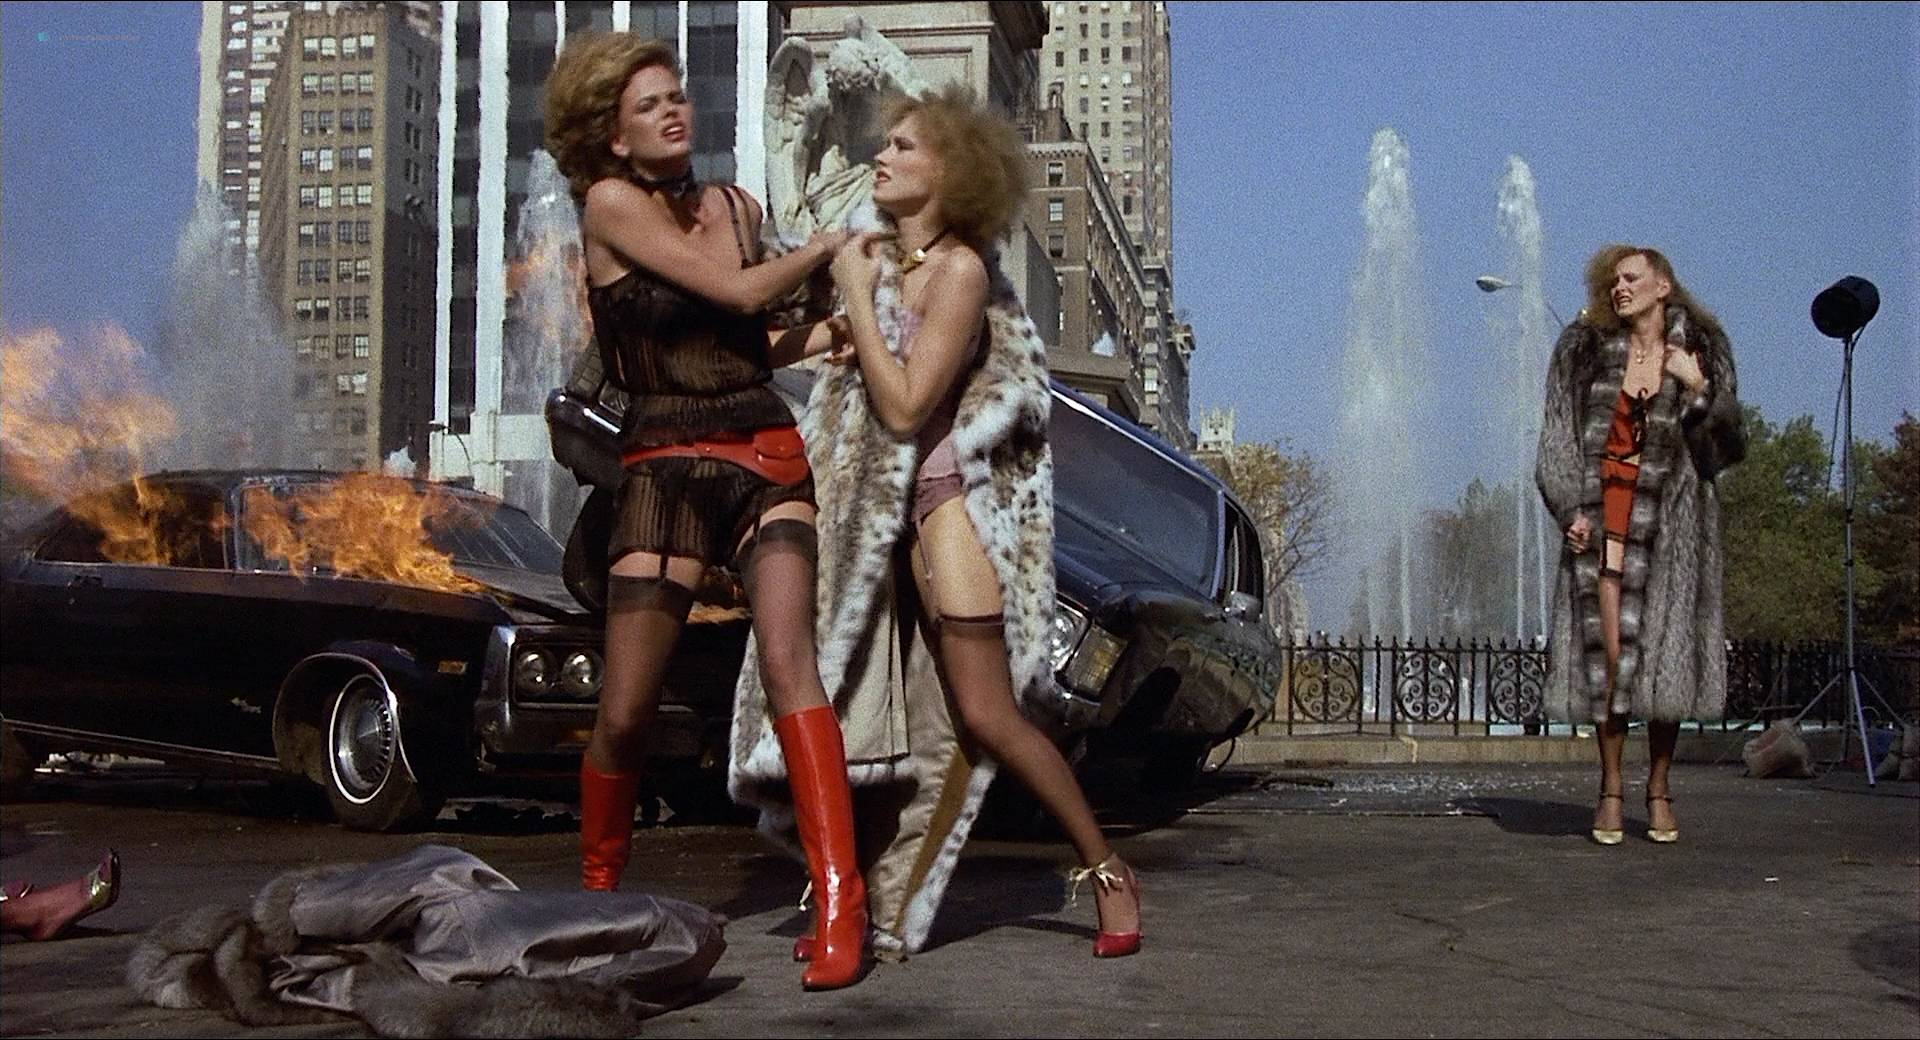 Darlanne Fluegel nude topless Lisa Taylor and Rita Tellone nude topless too - Eyes of Laura Mars (1978) HD 1080p BluRay (13)